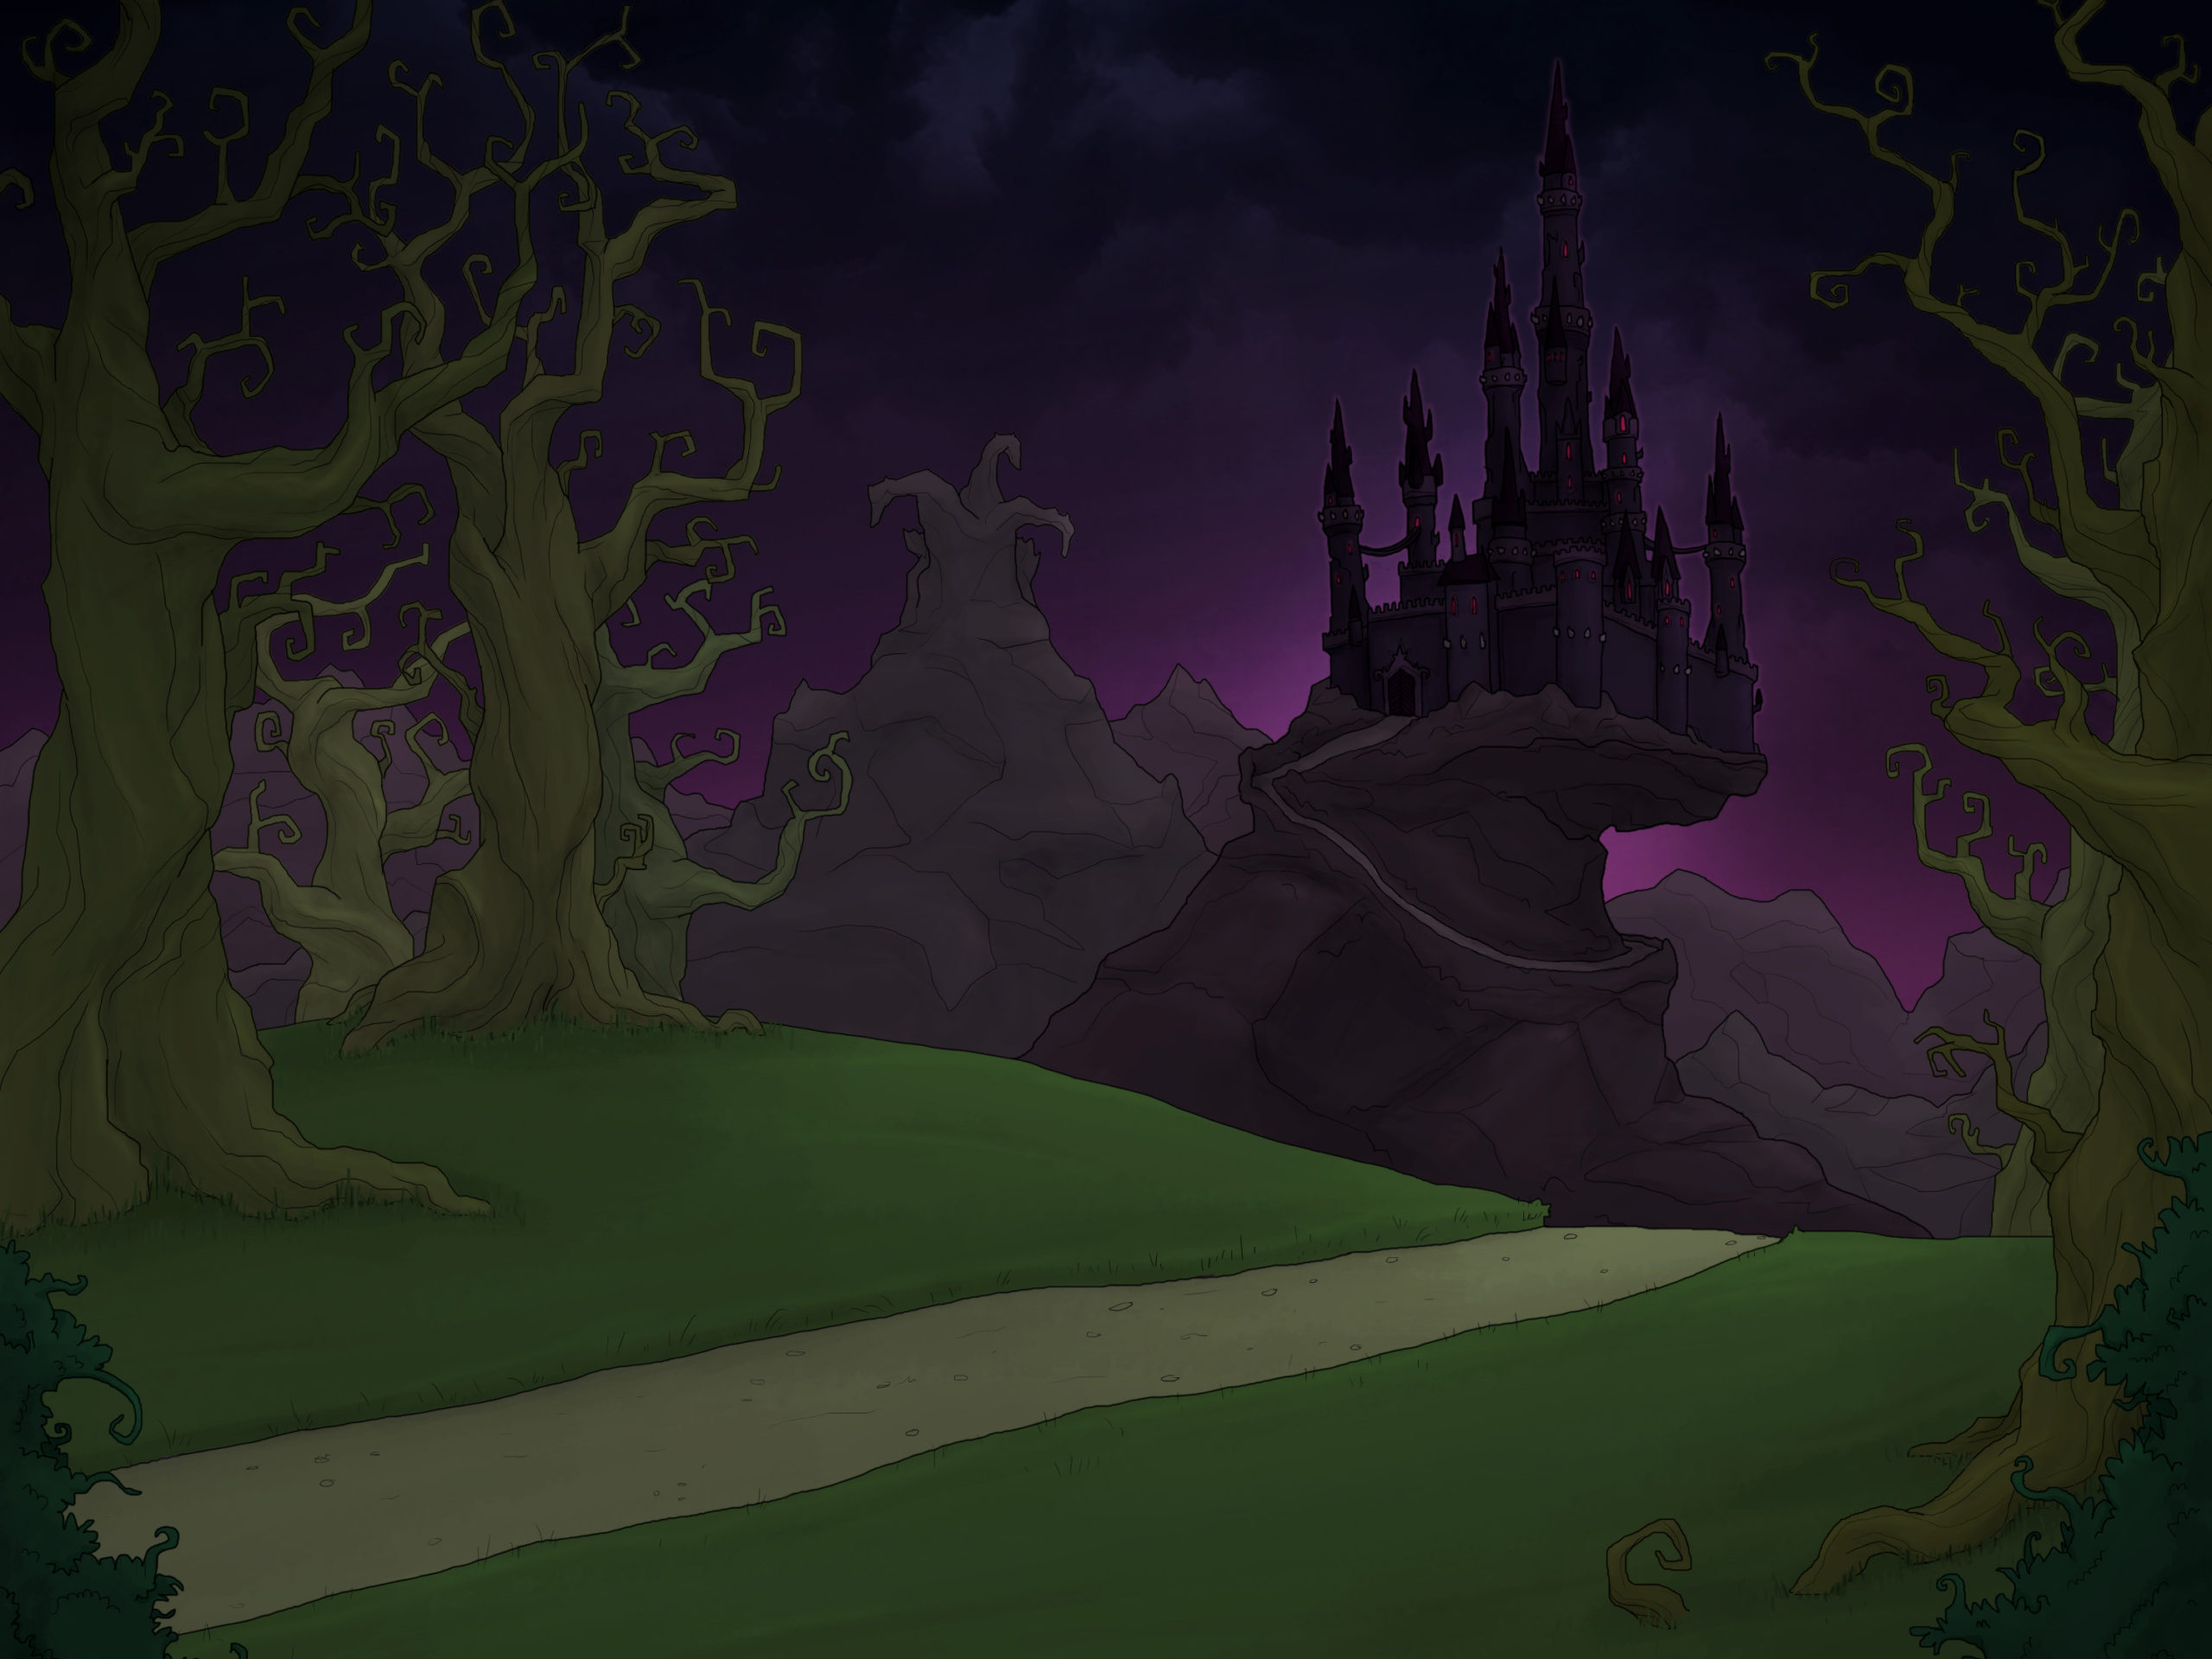 stage-evil-castle